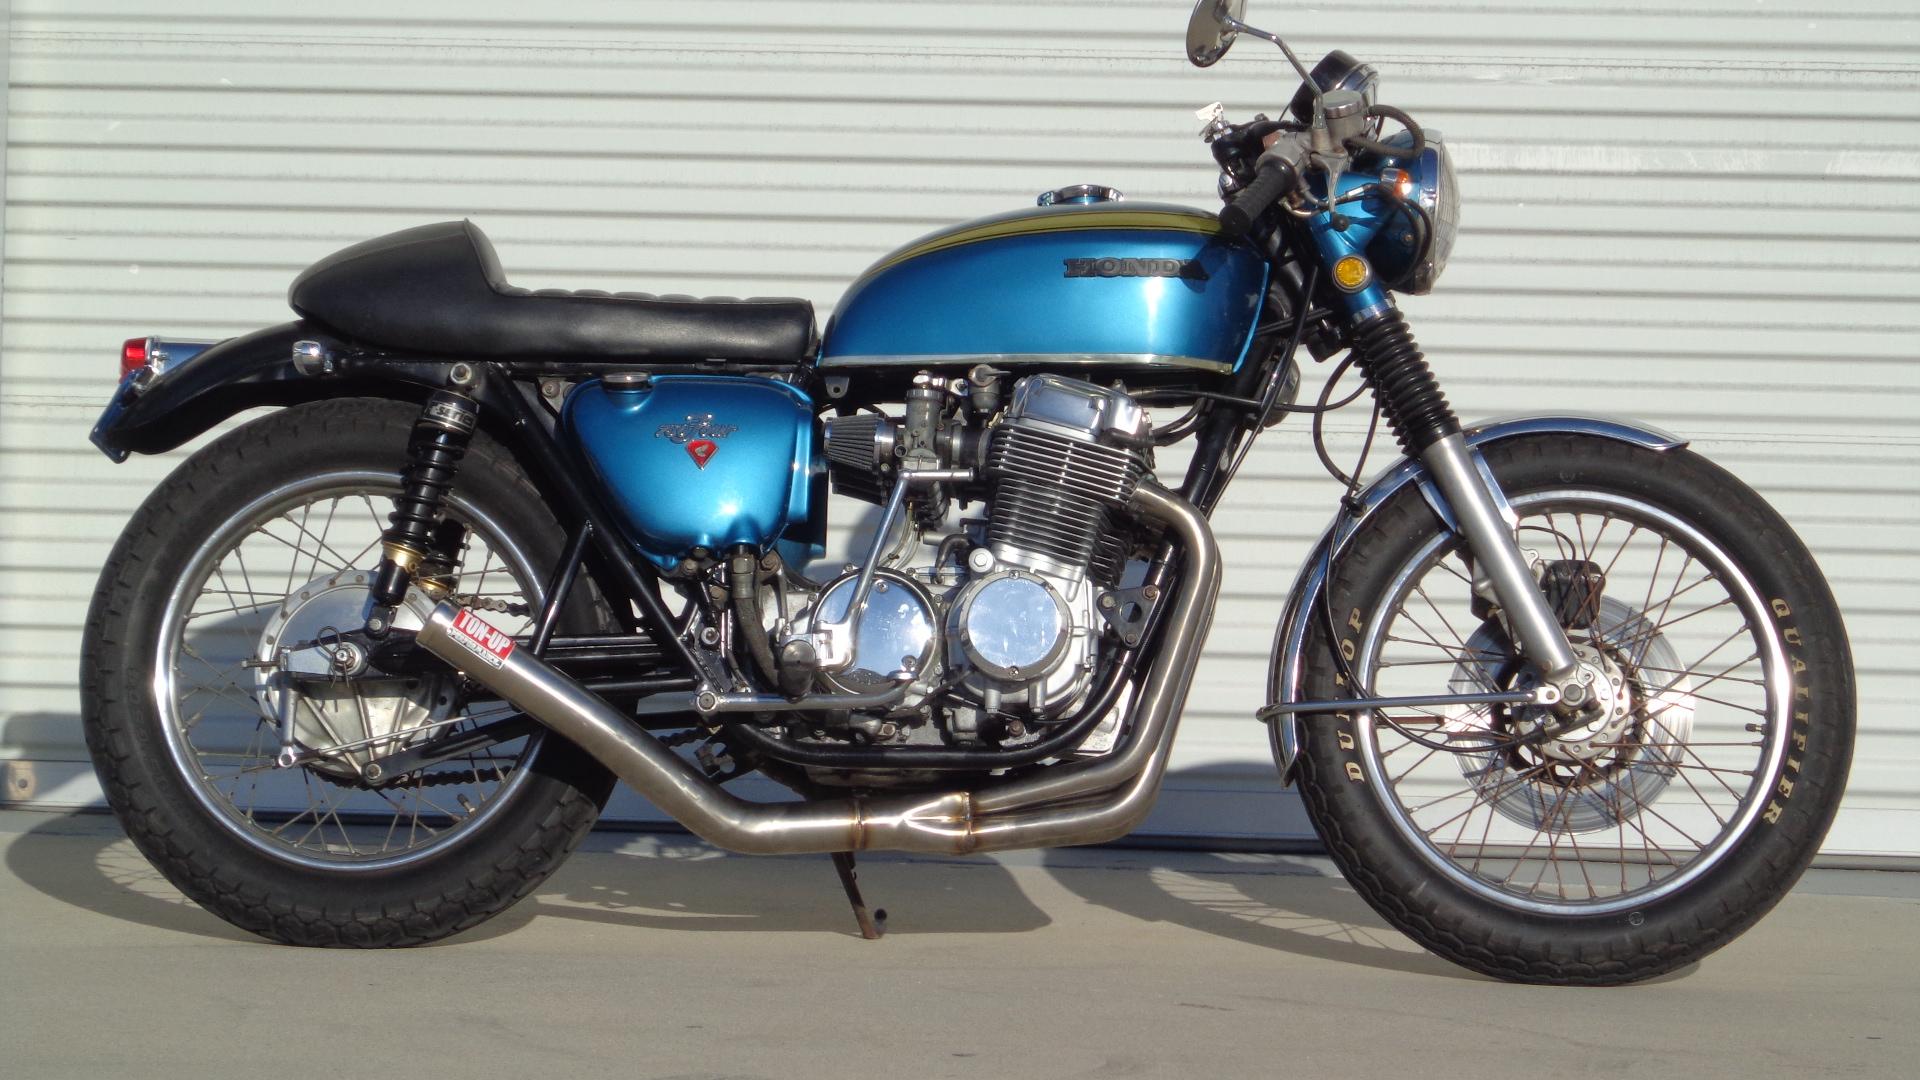 1971 CB750 CAFE RACER FOR SALE 4000